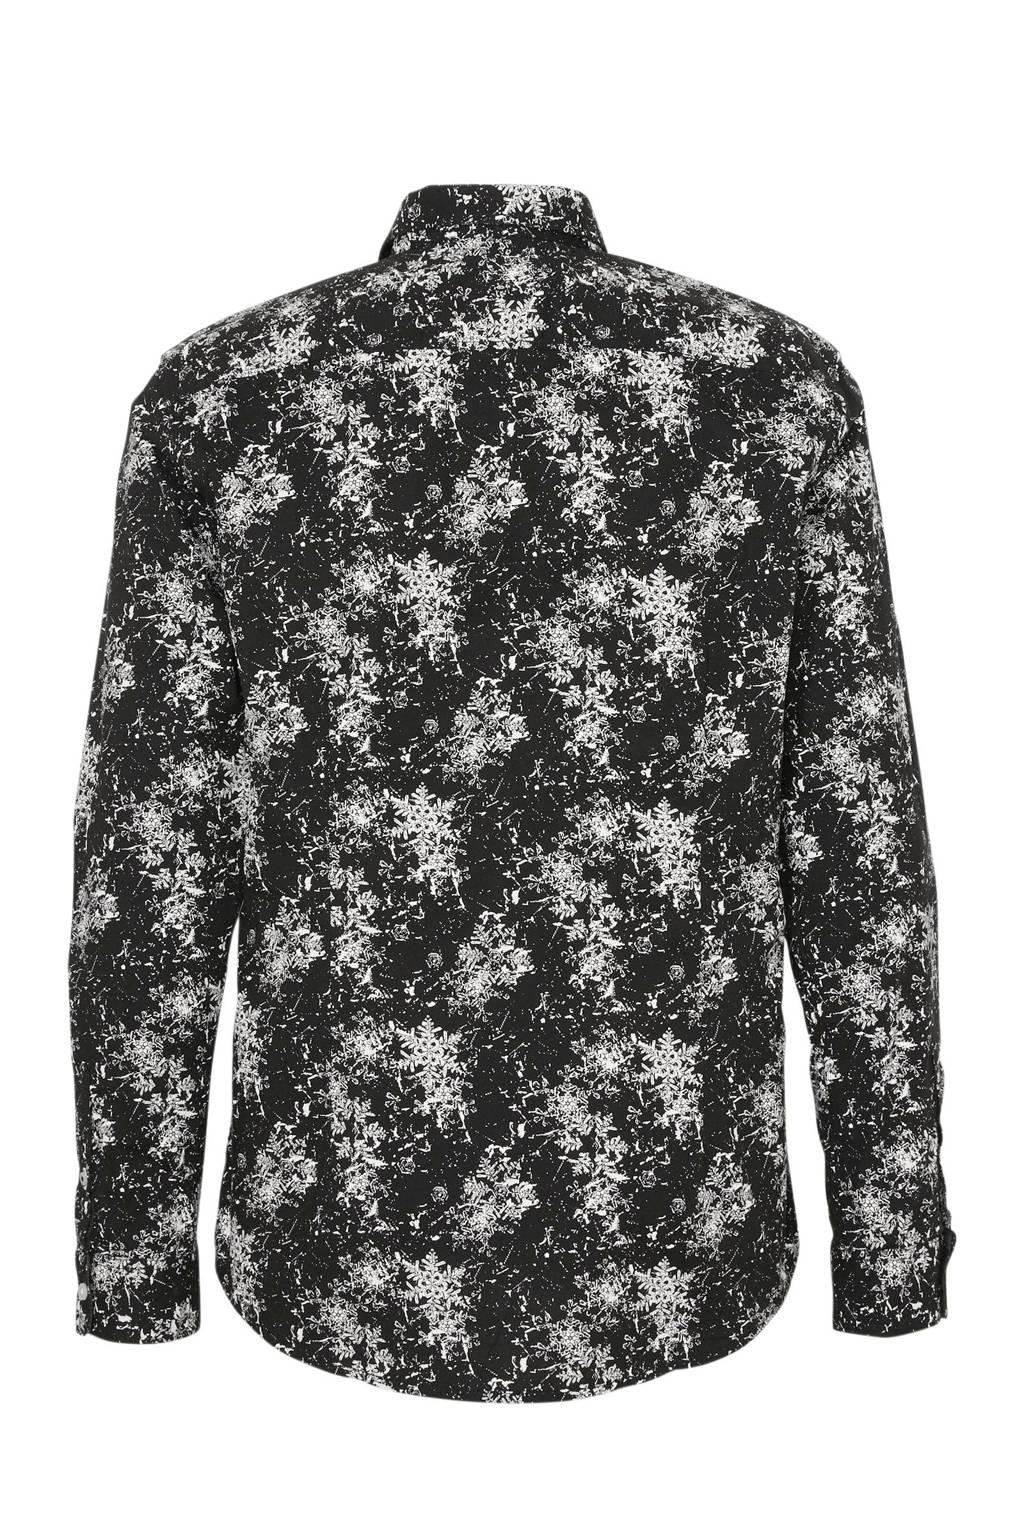 Tom Tailor slim fit overhemd met all over print zwart, Zwart